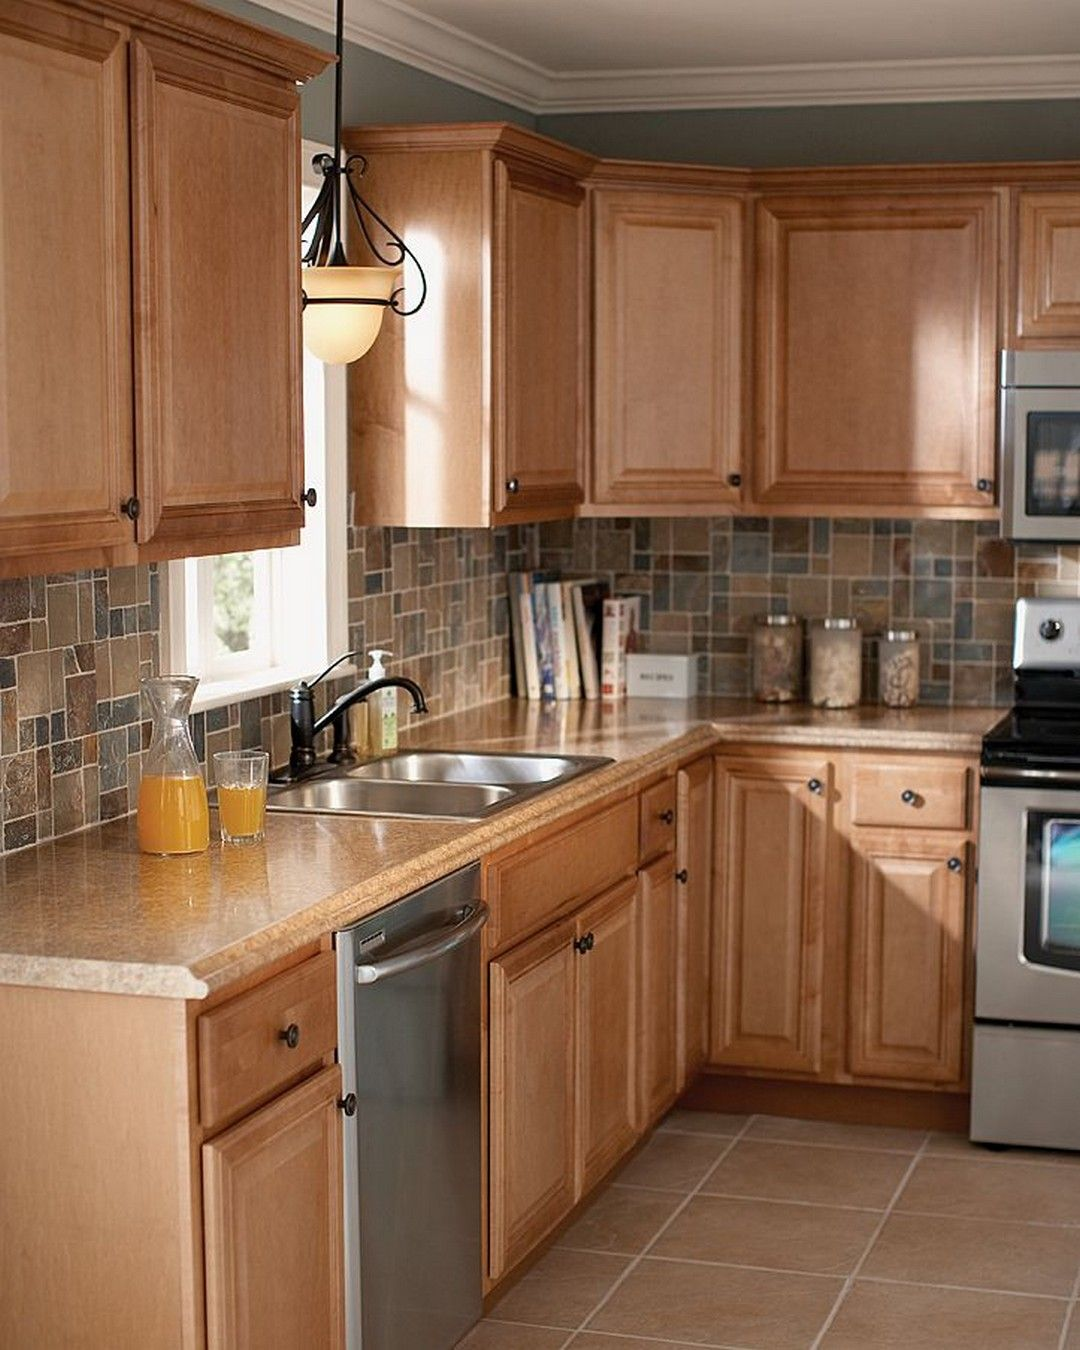 29 Fantastic Kitchen Backsplash Ideas With Oak Cabinets Https Kitchendecorpad Com 2018 10 1 Kitchen Remodel Small Kitchen Remodel Kitchen Remodeling Projects